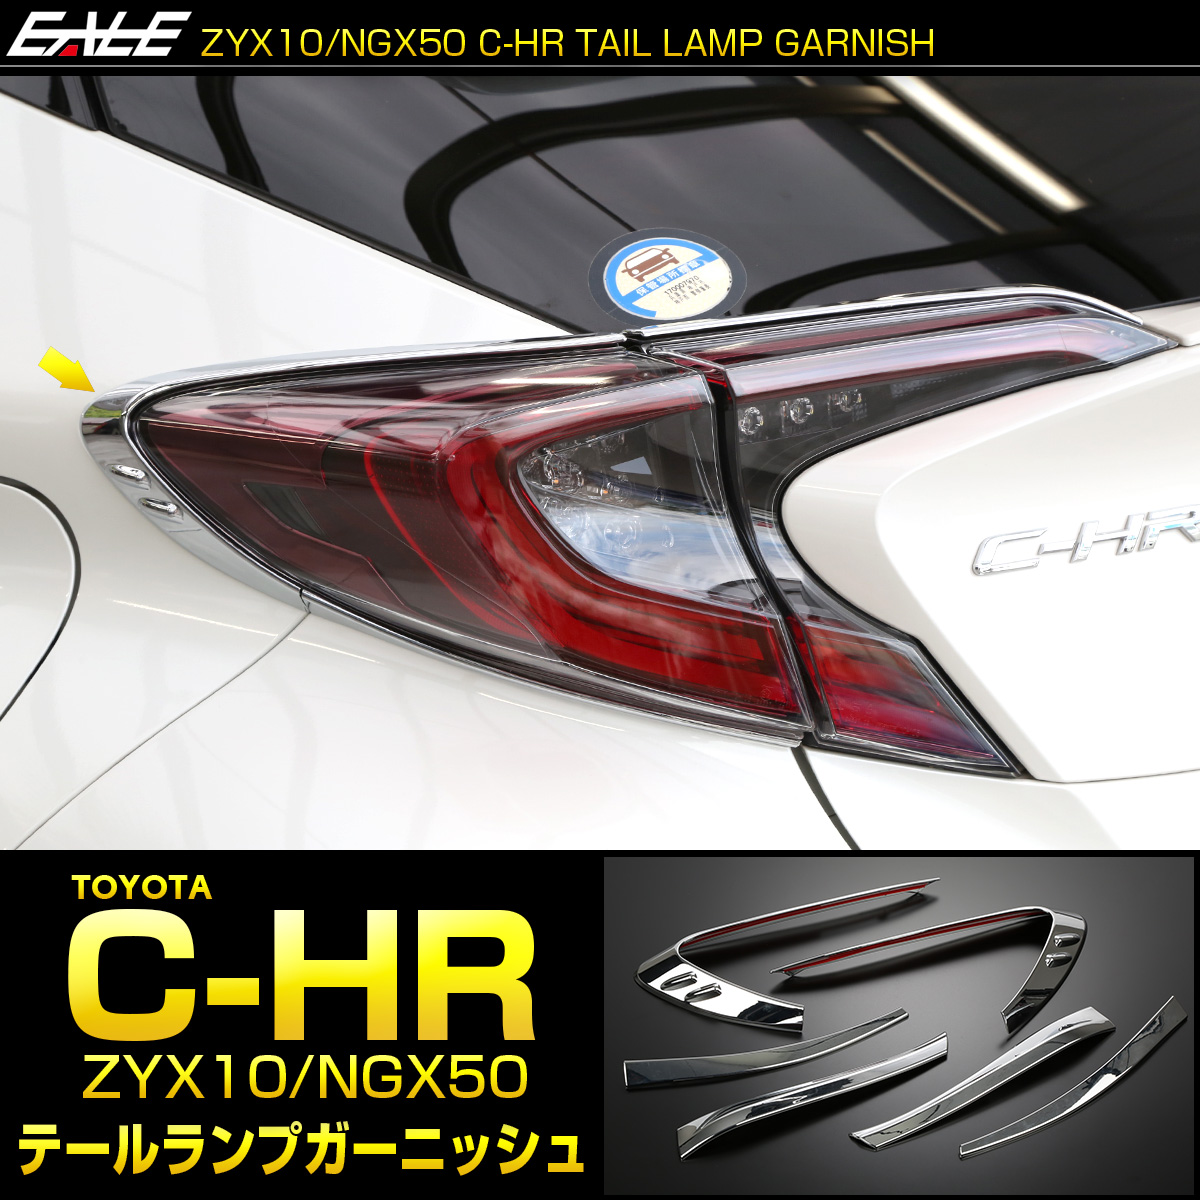 C-HR テールランプ メッキ トリム セット ZYX10 NGX50 メッキパーツ テールランプ ガーニッシュ LB0016